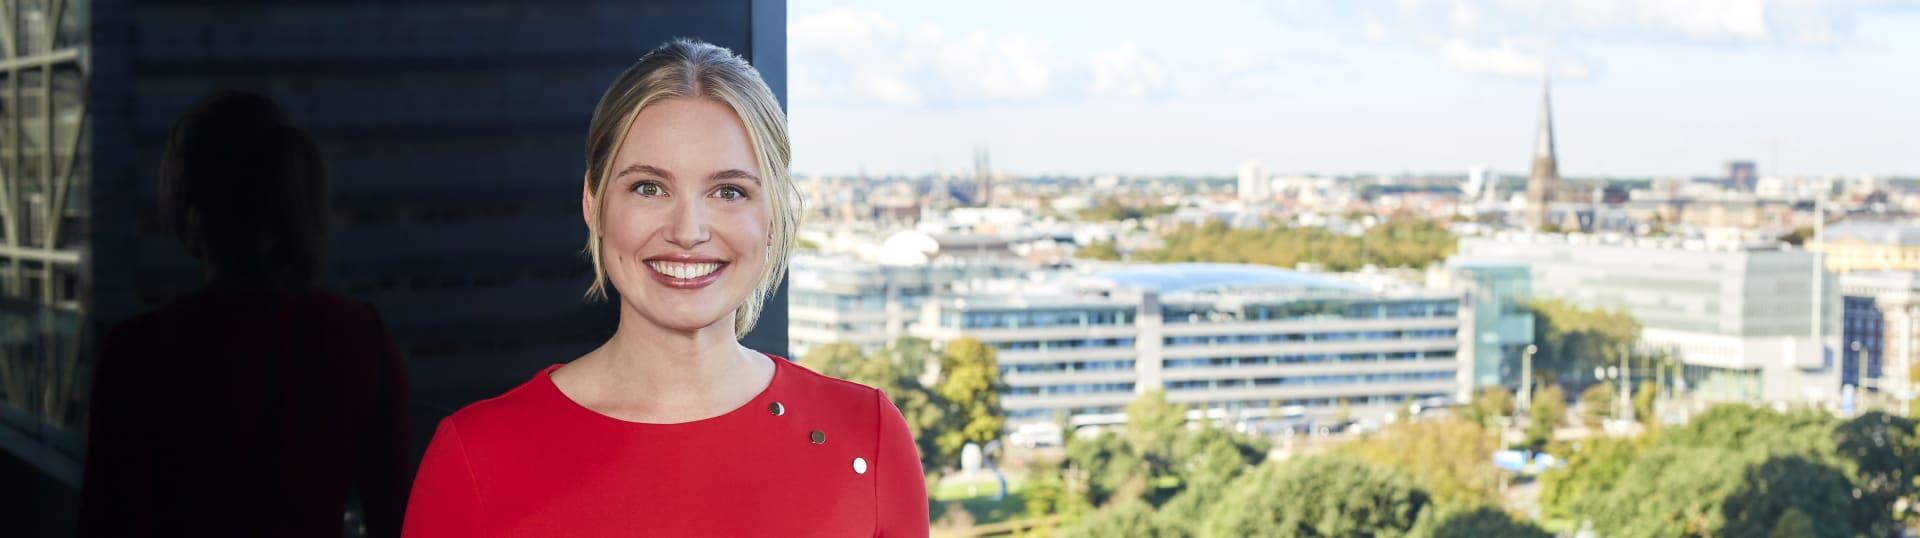 Claire Wiltink, advocaat Pels Rijcken